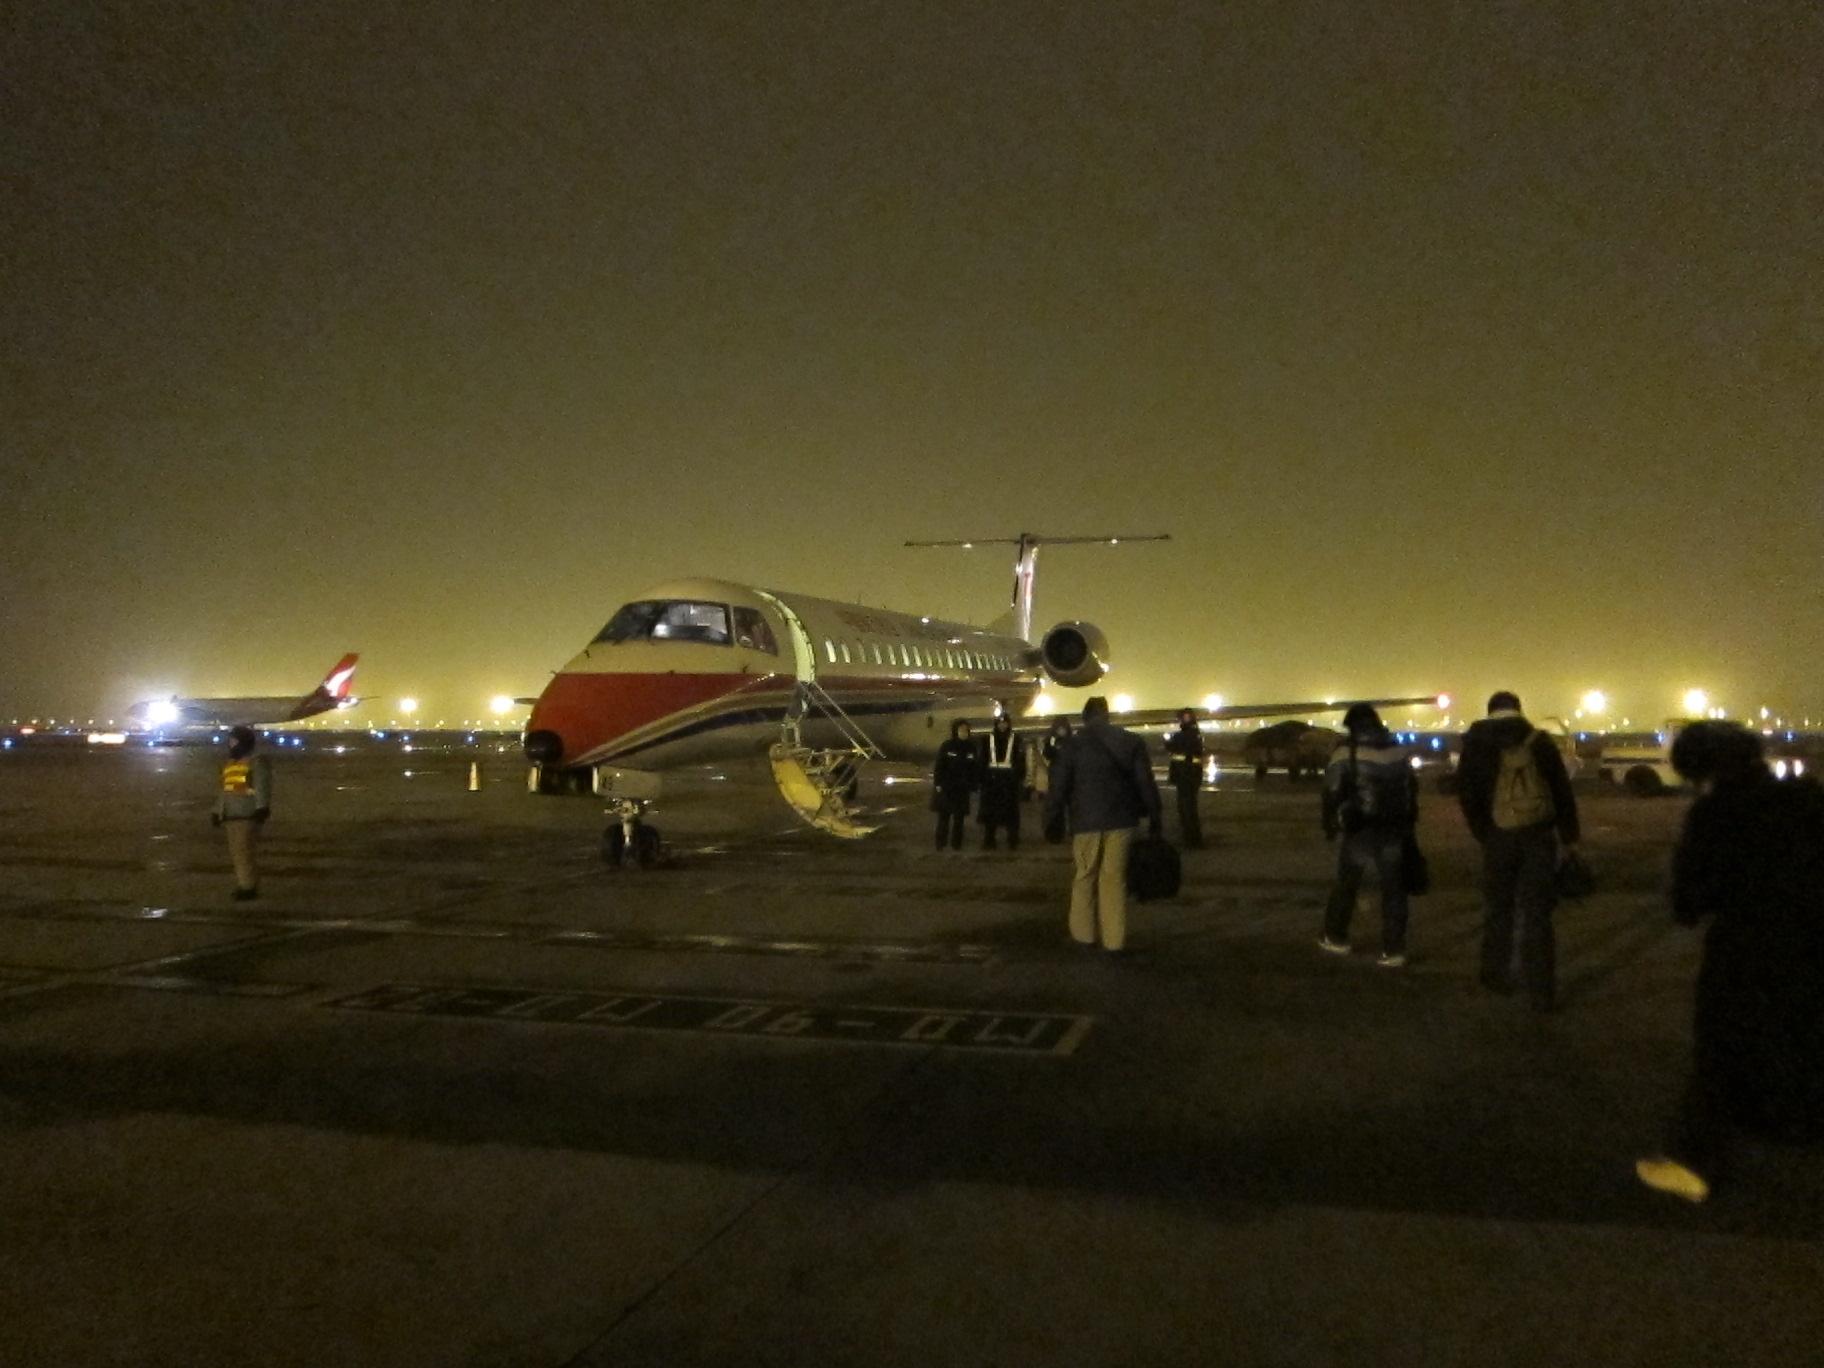 Shanghai to Nanjing Plane